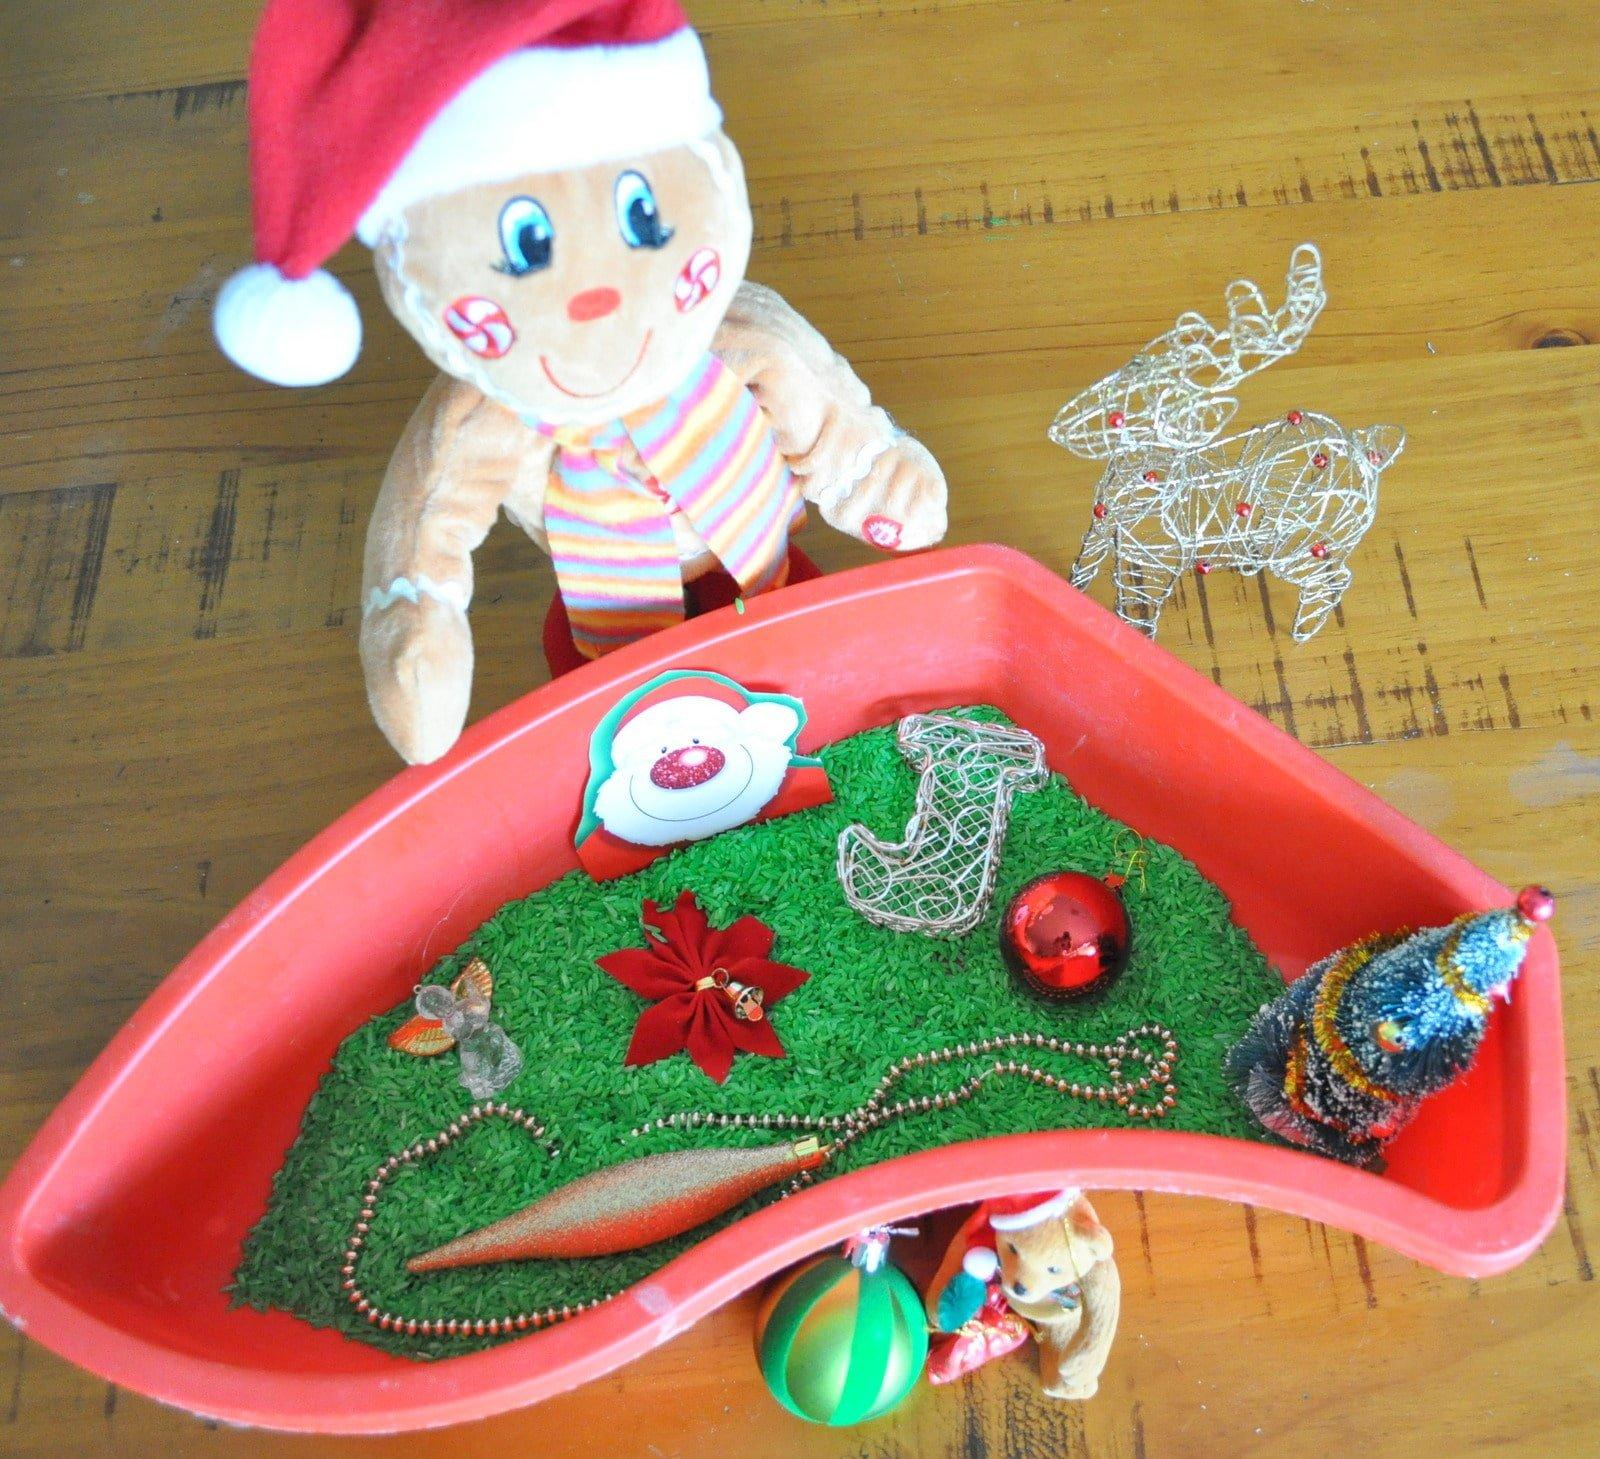 Sensory Christmas Activity For Kids Brisbane Kids